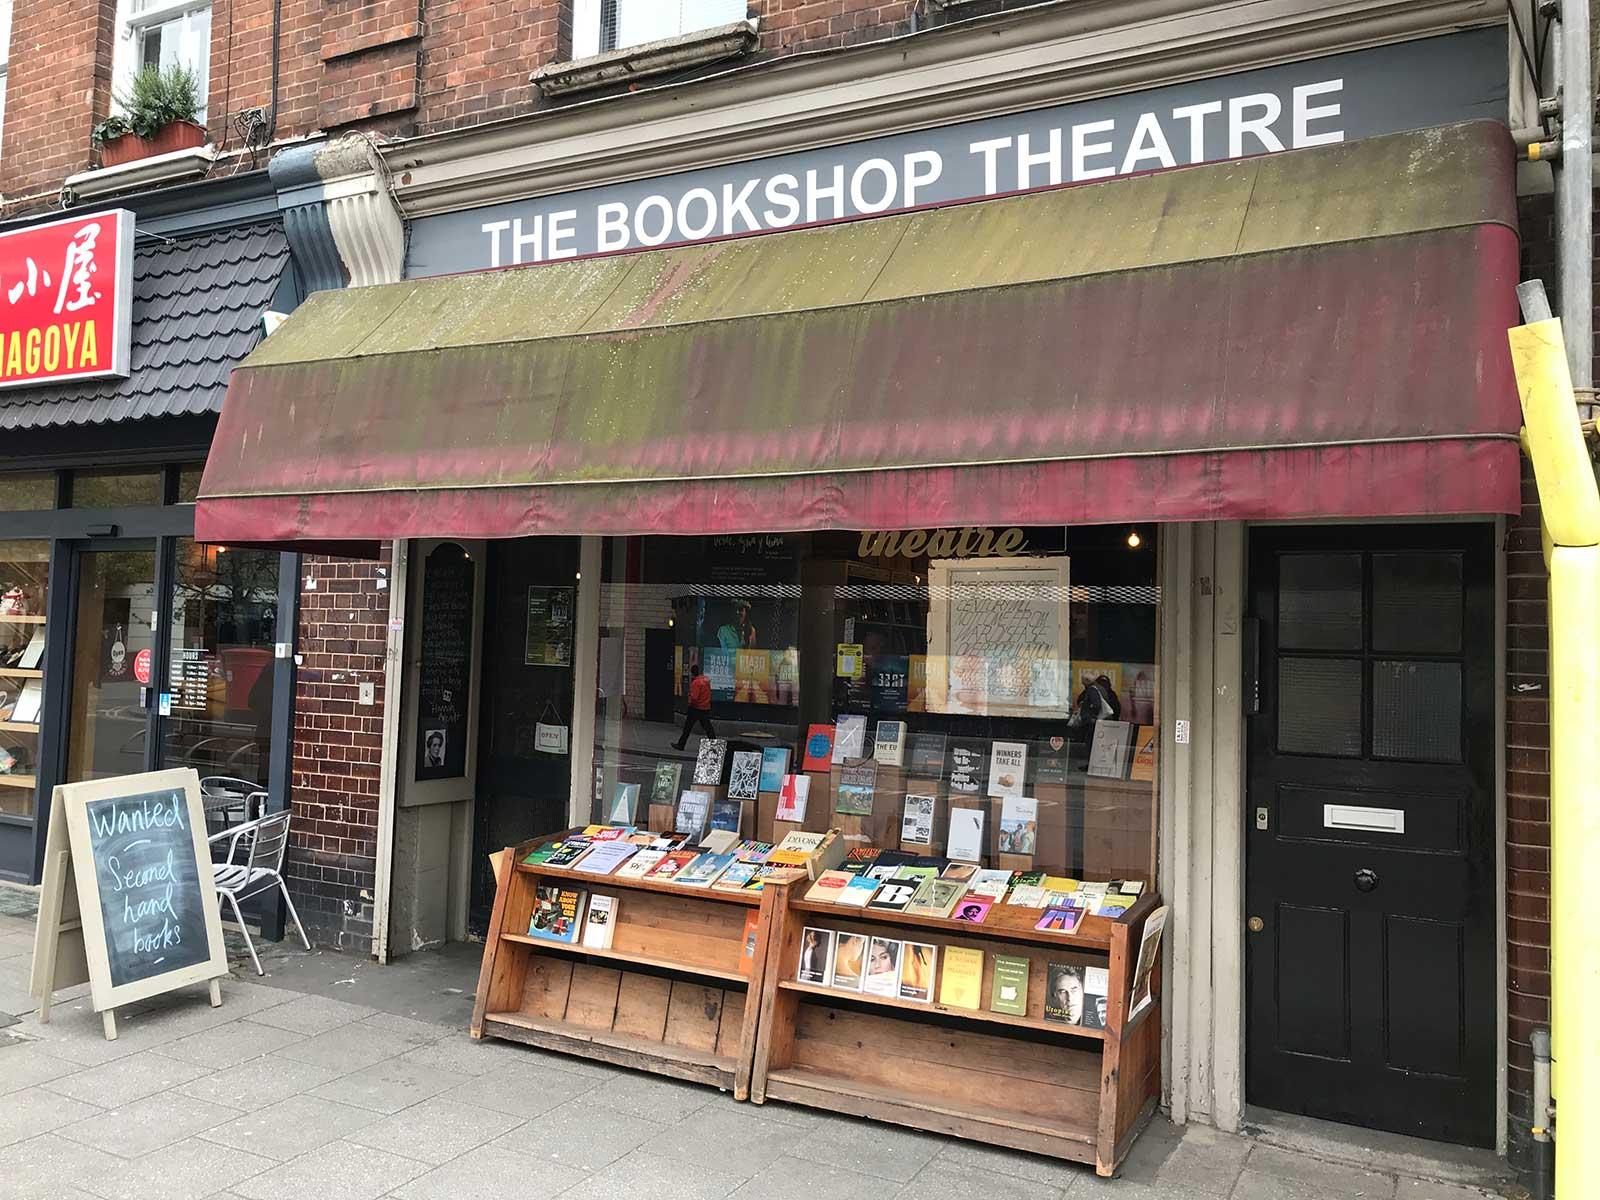 The Calder Bookshop and Theatre